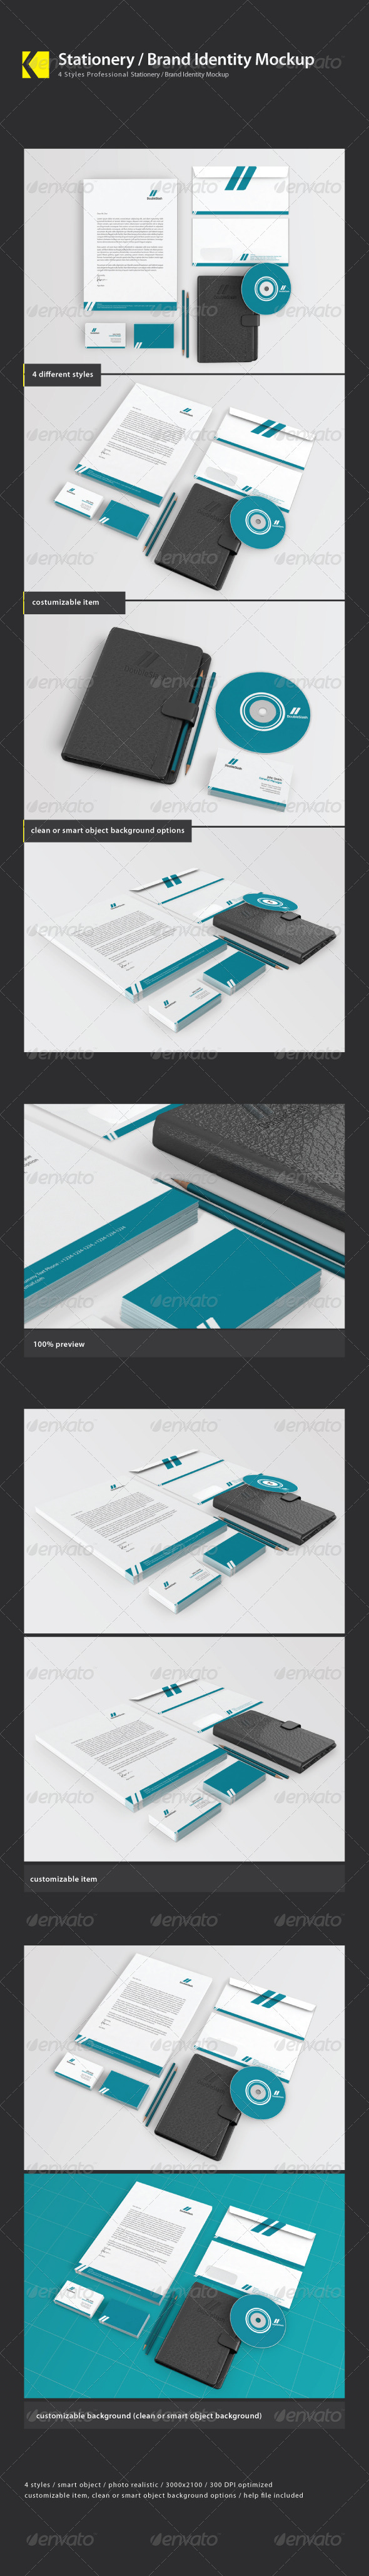 GraphicRiver Stationery Brand Identity Mockups 3998795